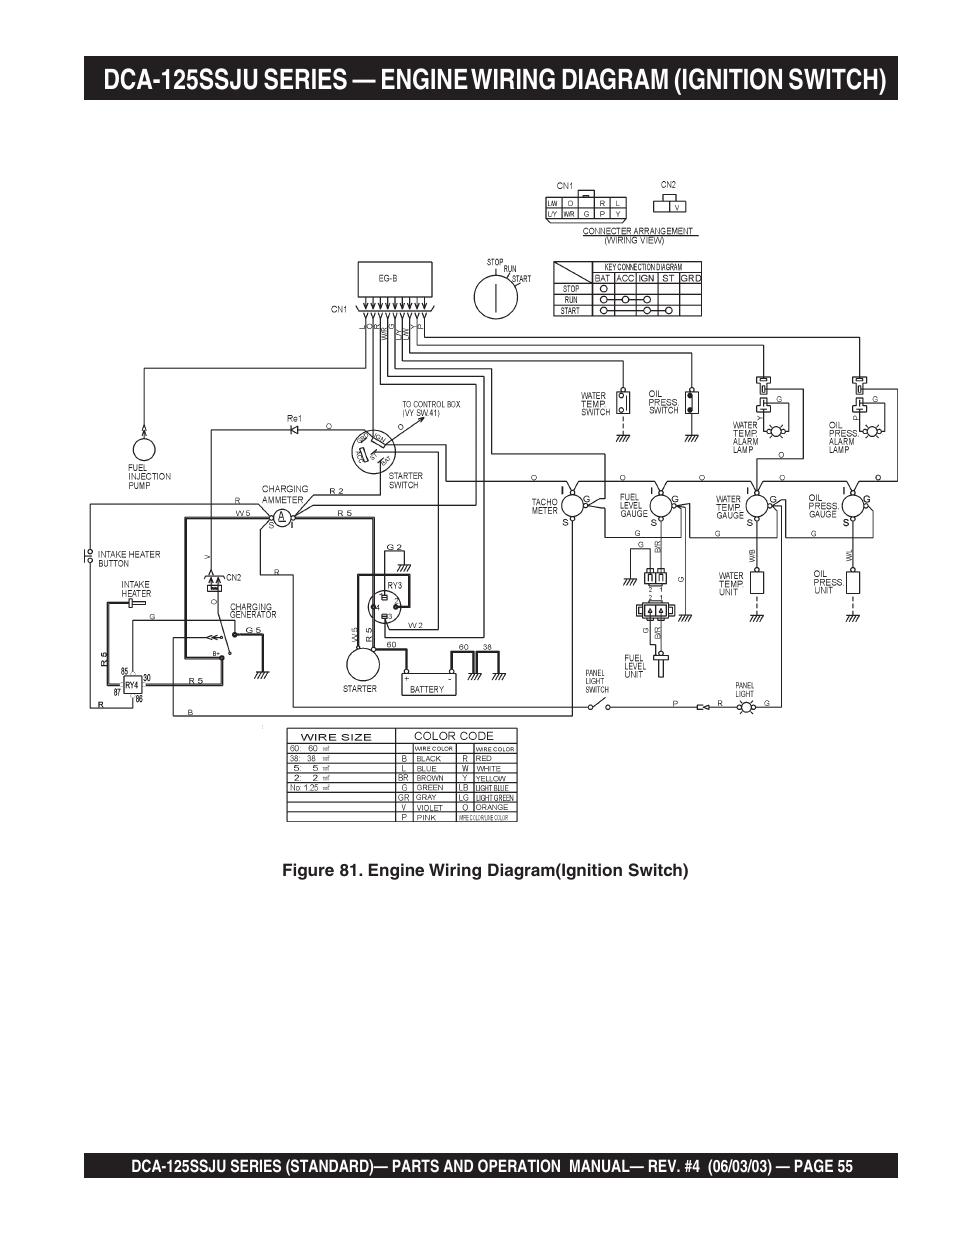 Multiquip mq power portable generator standard dca 125ssju user multiquip mq power portable generator standard dca 125ssju user manual page 55 96 also for dca125ssju2 dca125ssju asfbconference2016 Choice Image